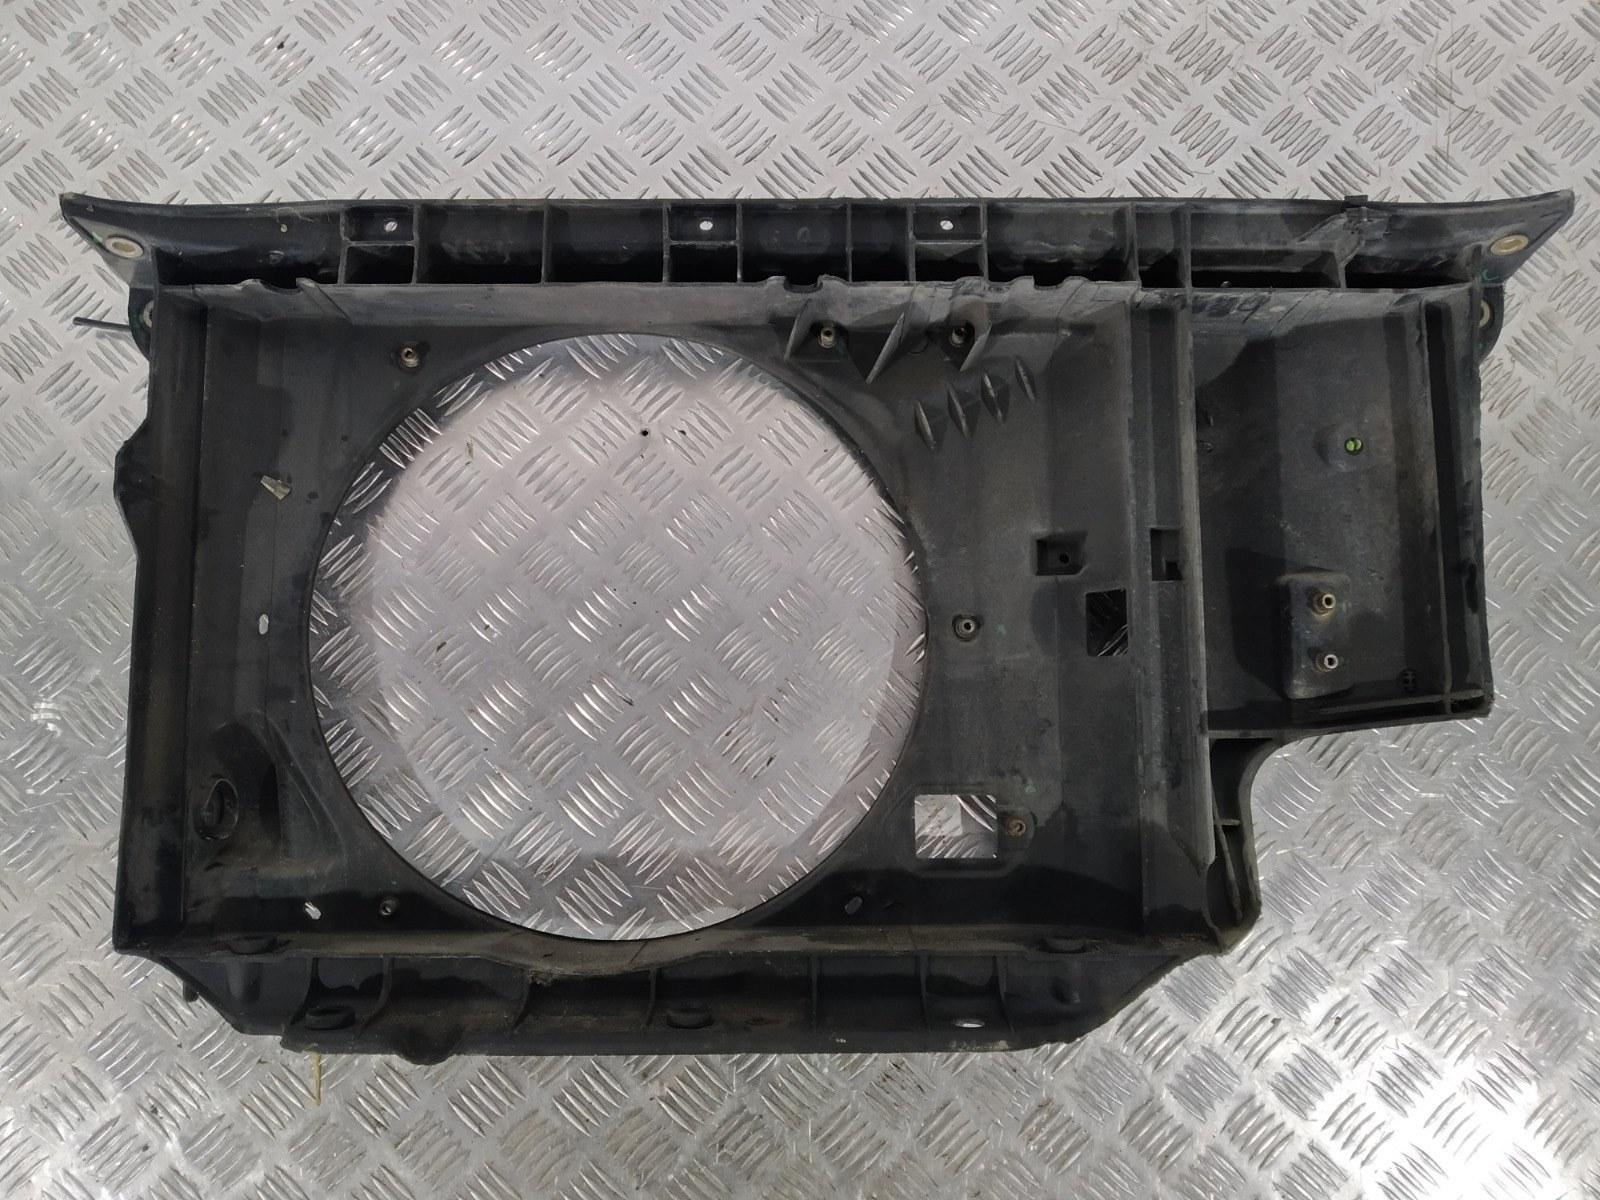 Диффузор вентилятора Peugeot 206 1.4 I 2004 (б/у)